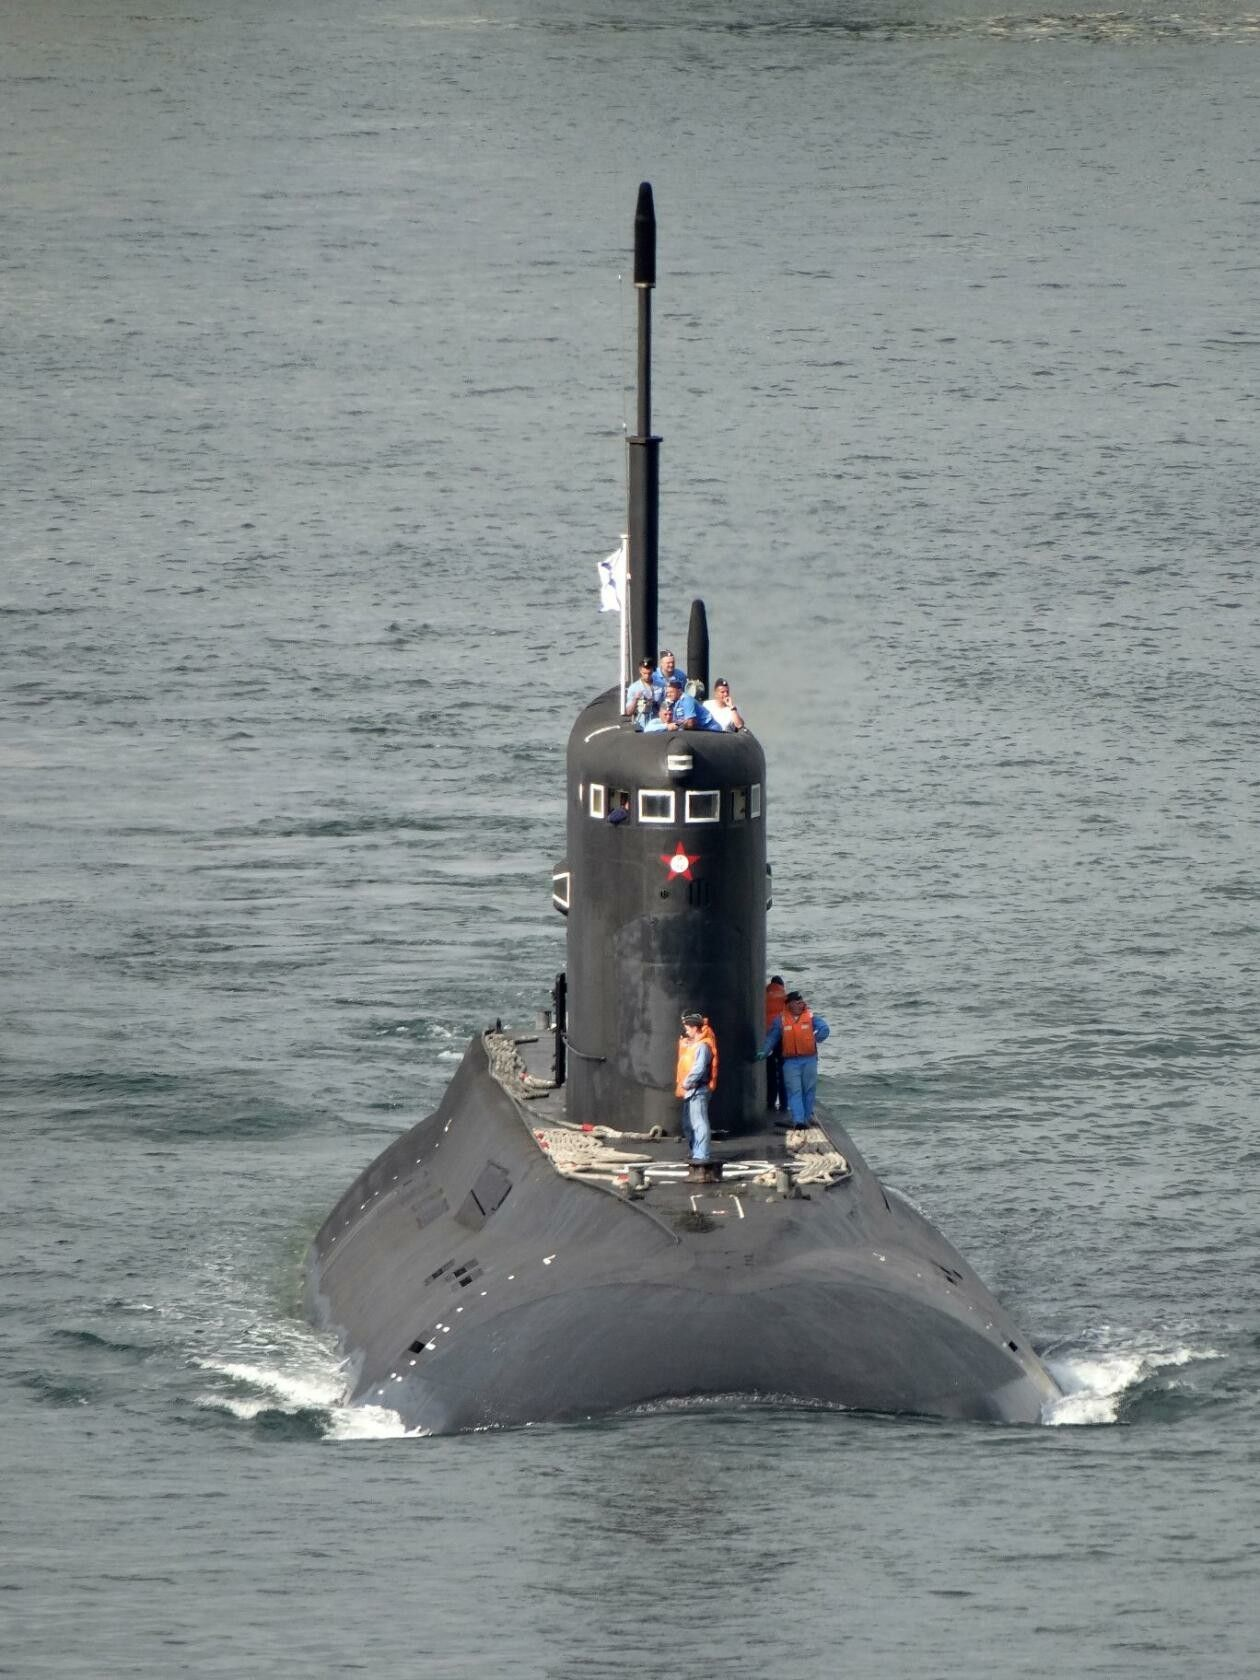 Pin By Kay Richter On Submarinos In 2020 Submarines Warship Navy Ships